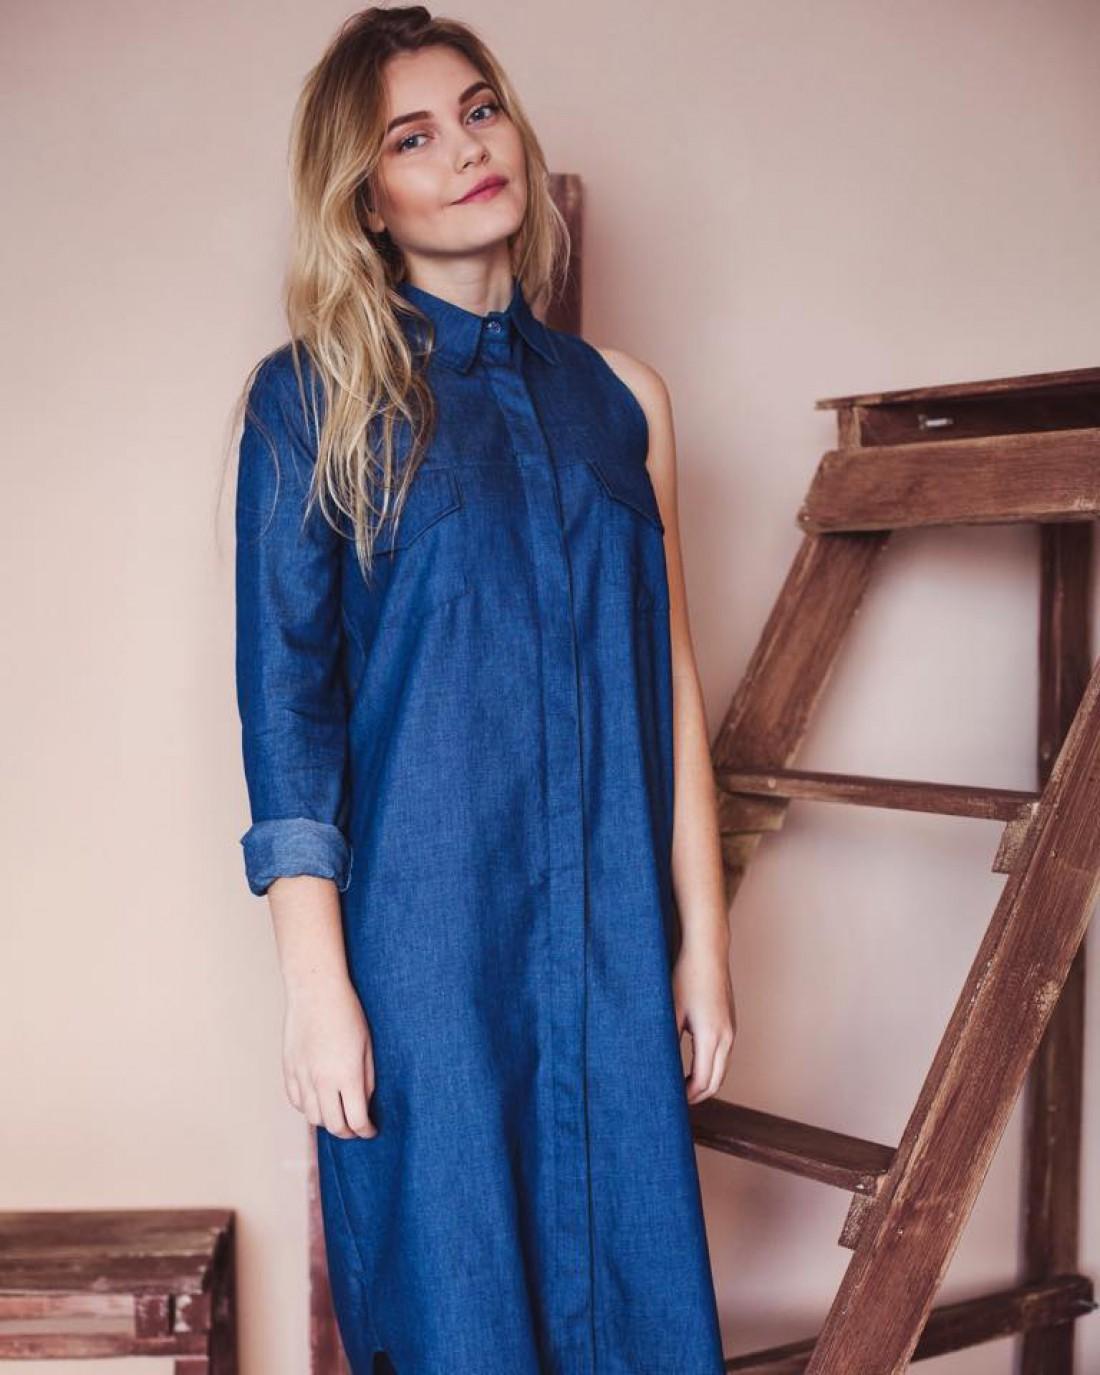 Платье-рубашка из синего денима